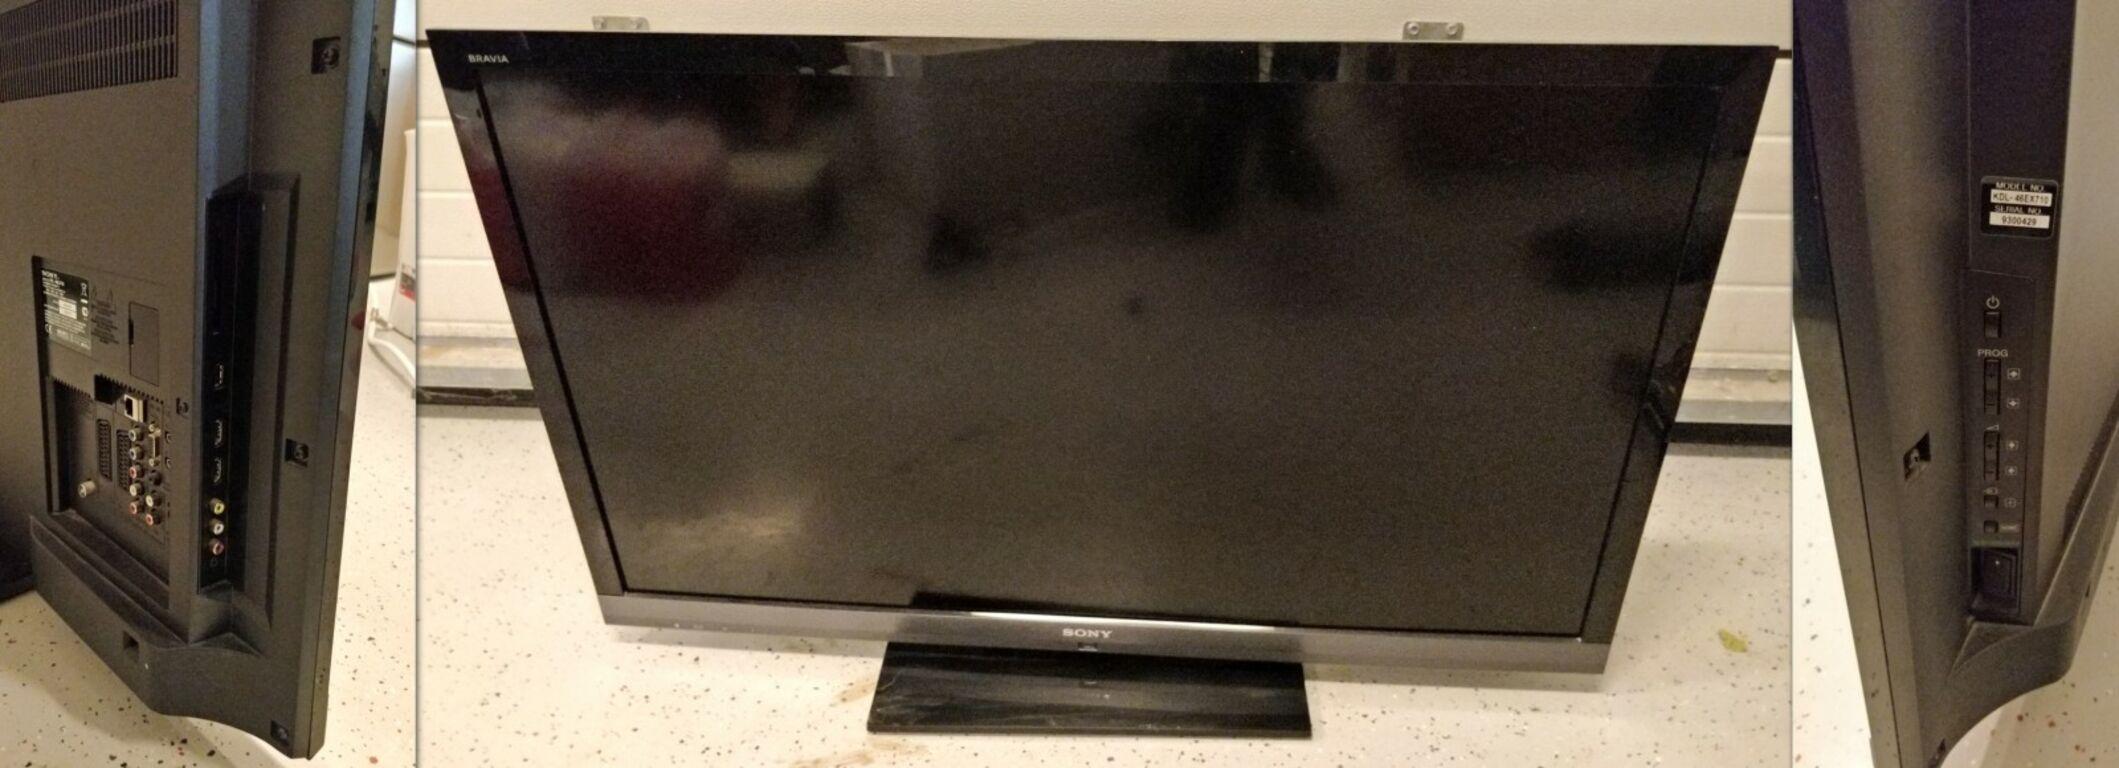 Teler/tv sony 46 tolli